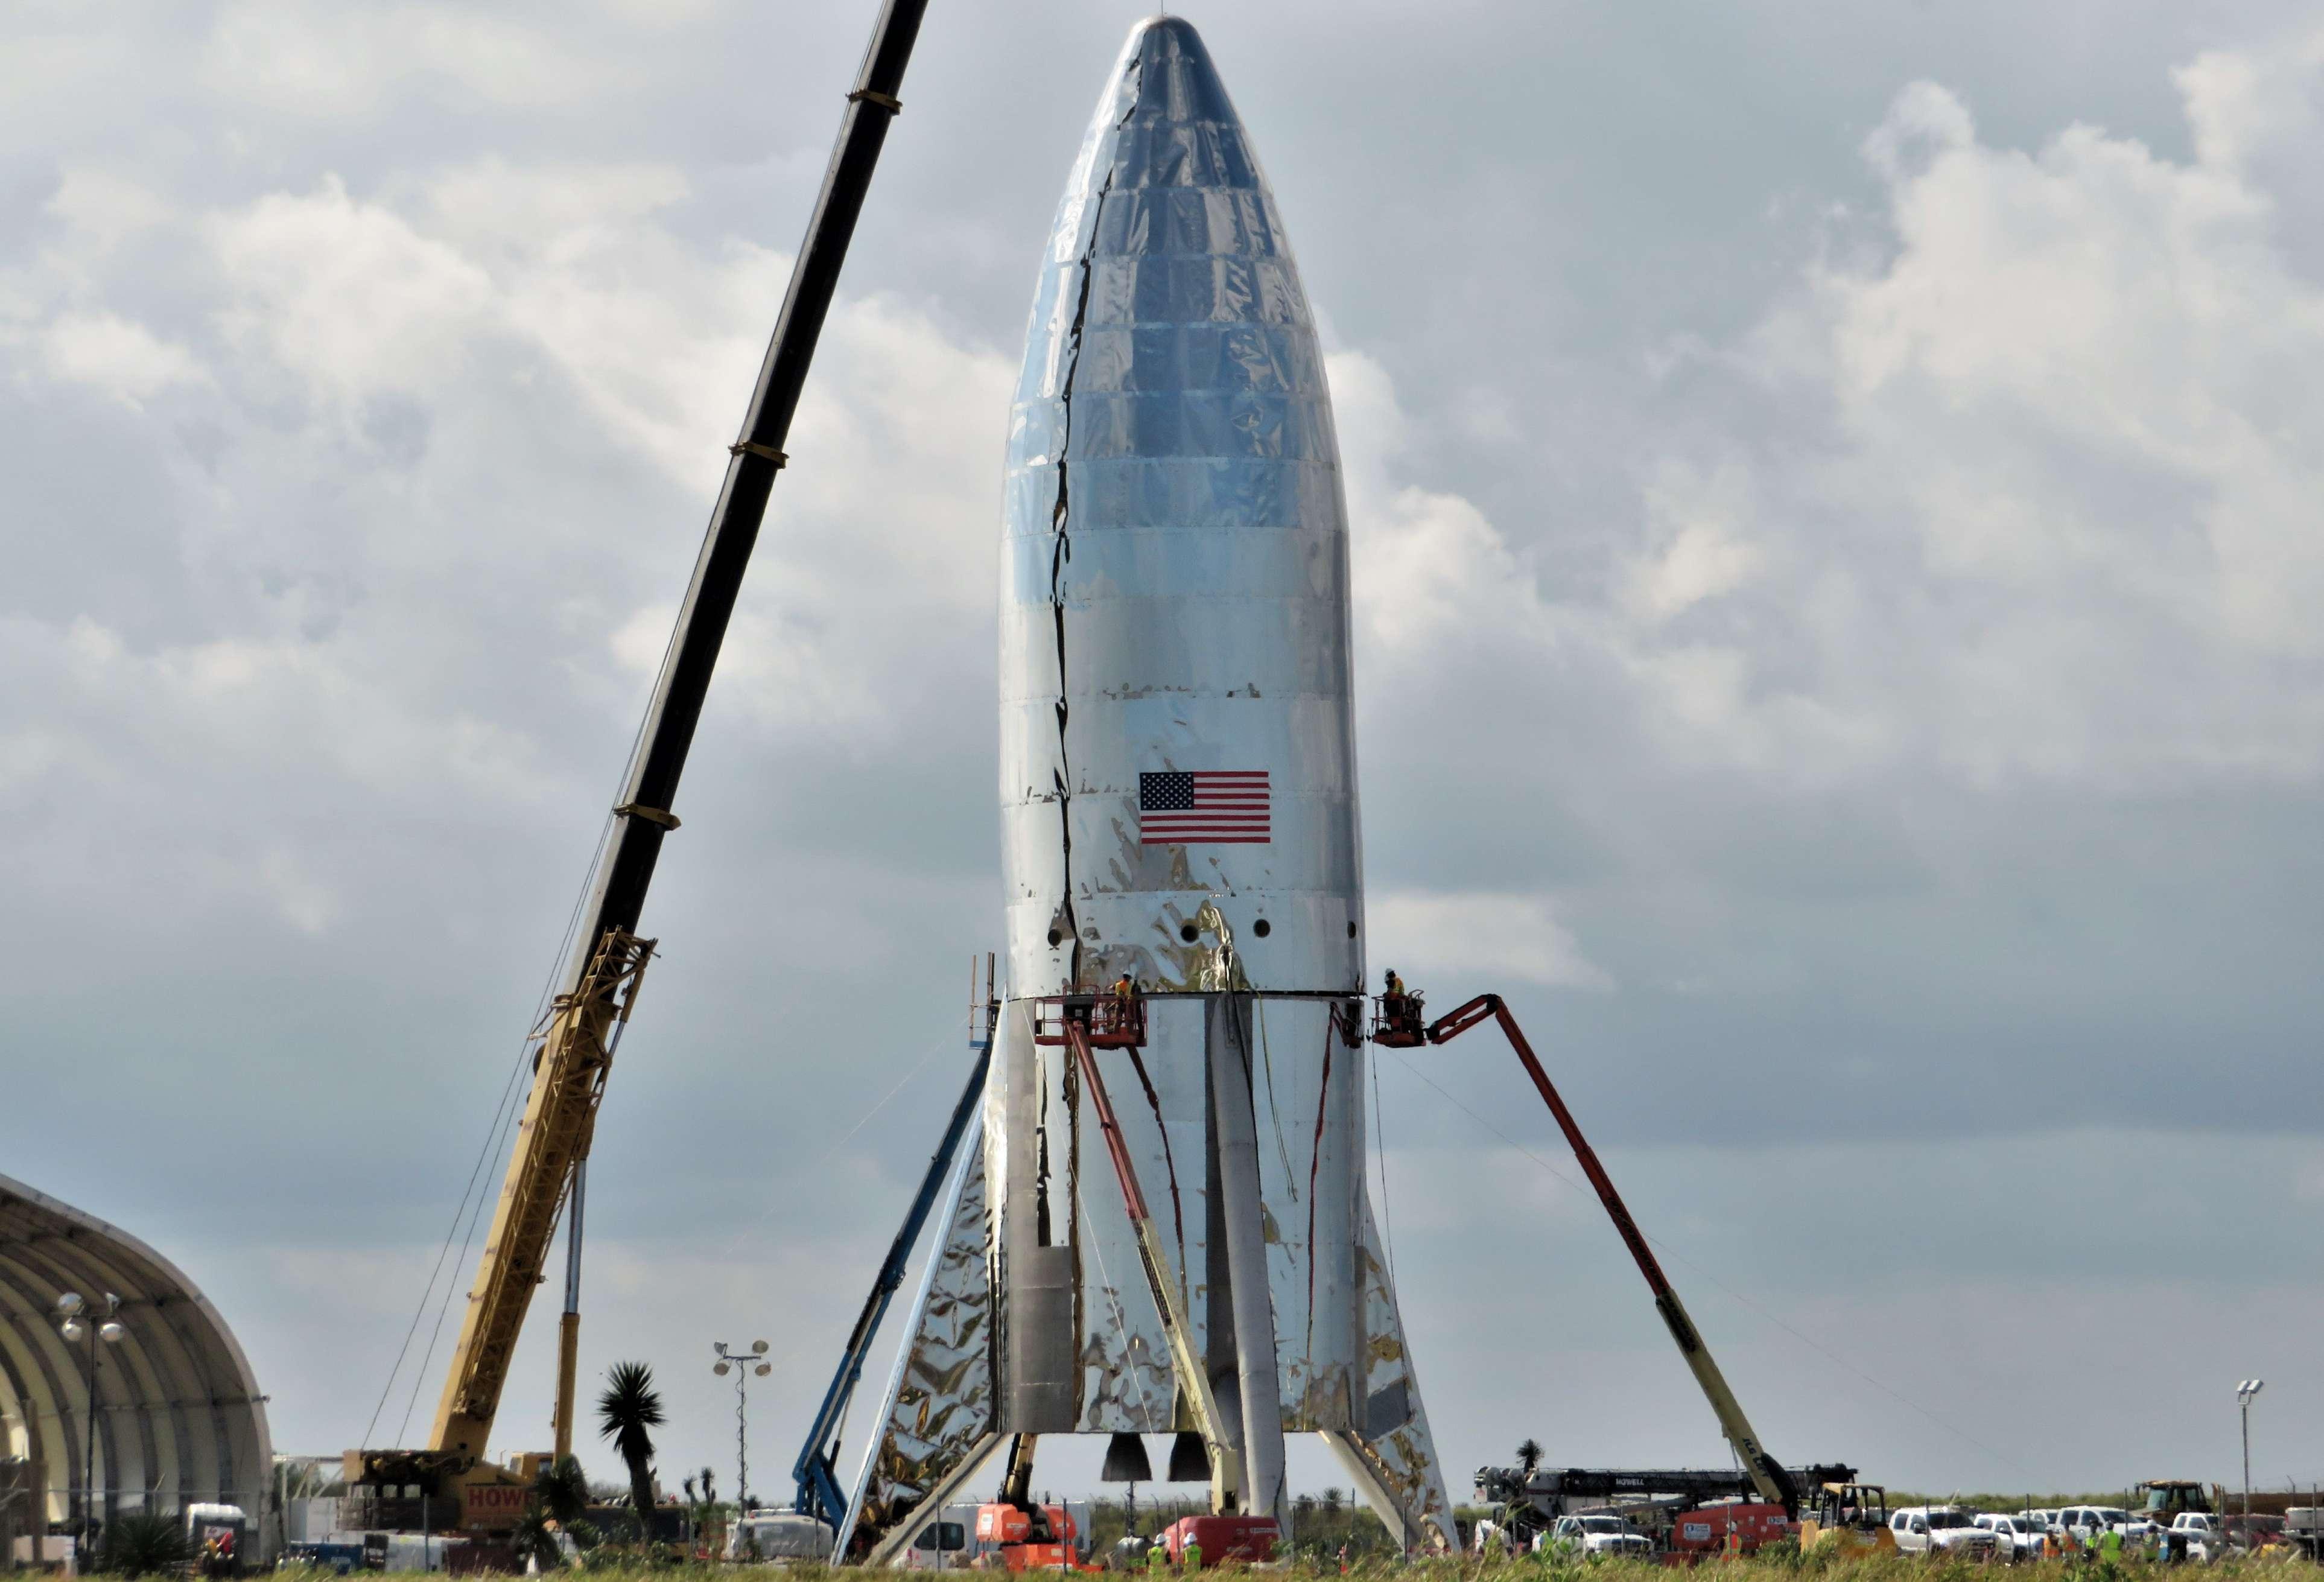 Boca Chica Starship Alpha progress 010818 (NSF – bocachicagal) 1(c)